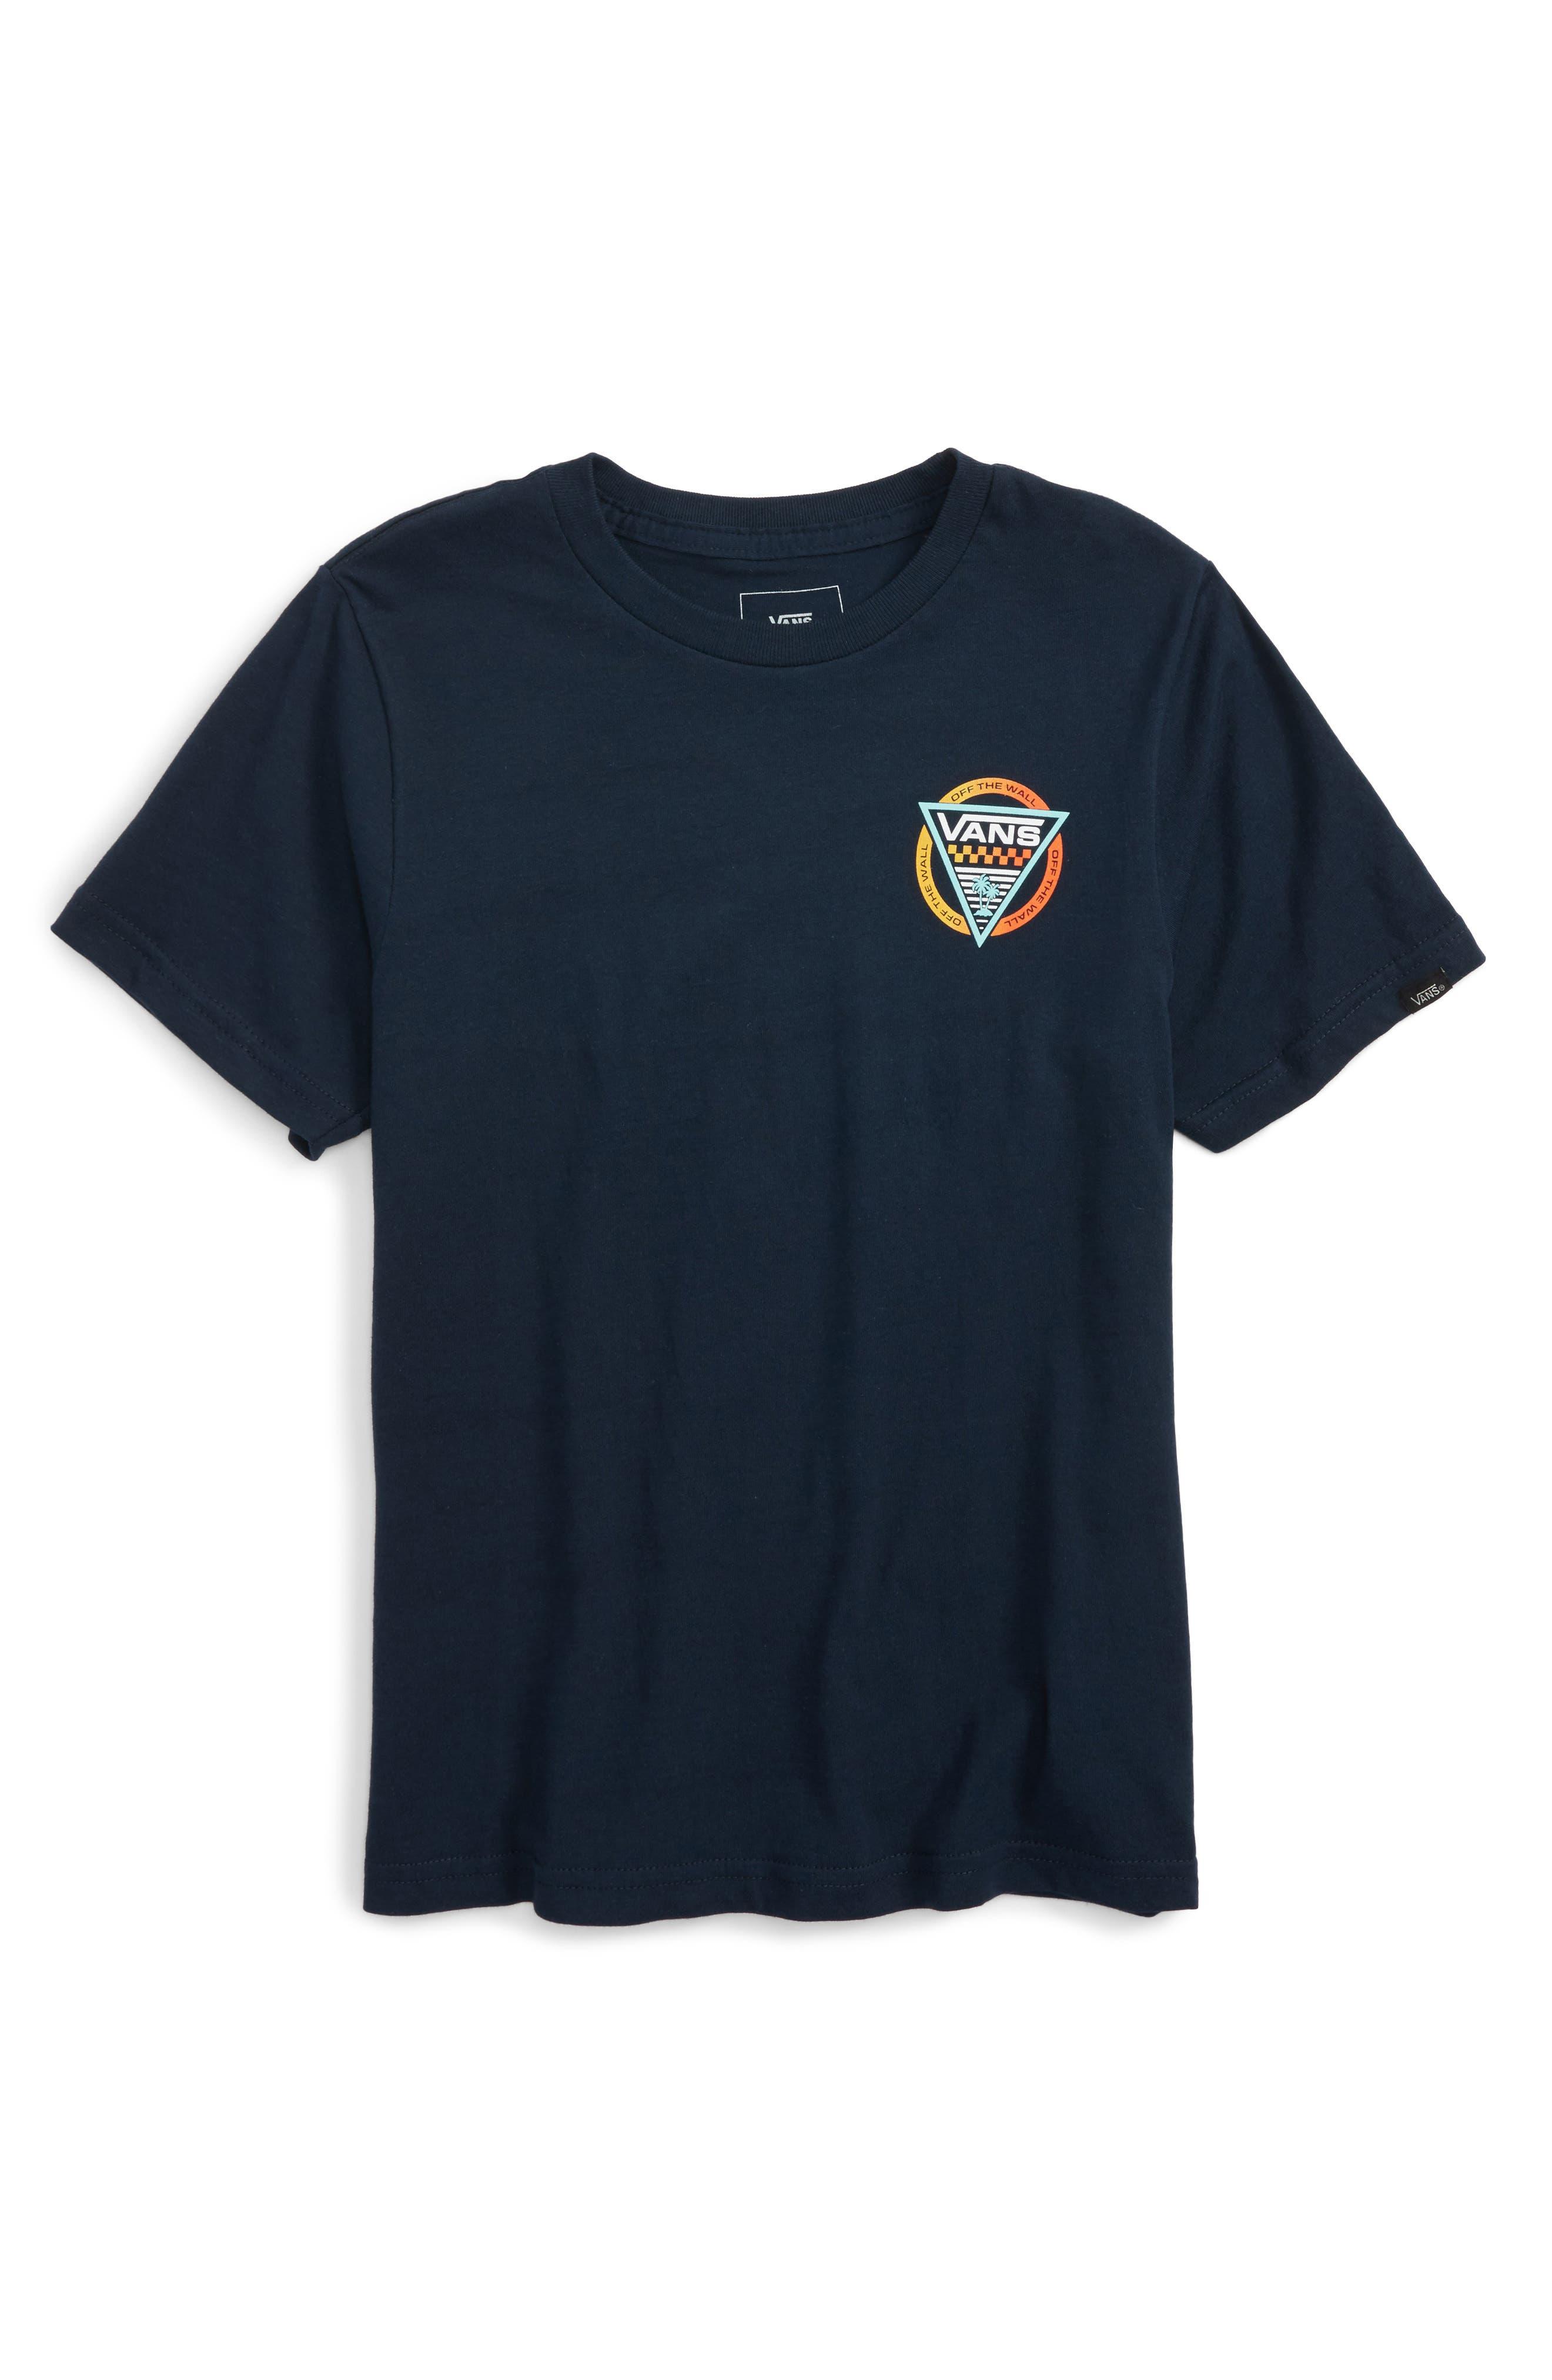 Vans By New Old Skool Graphic T-Shirt (Big Boys)